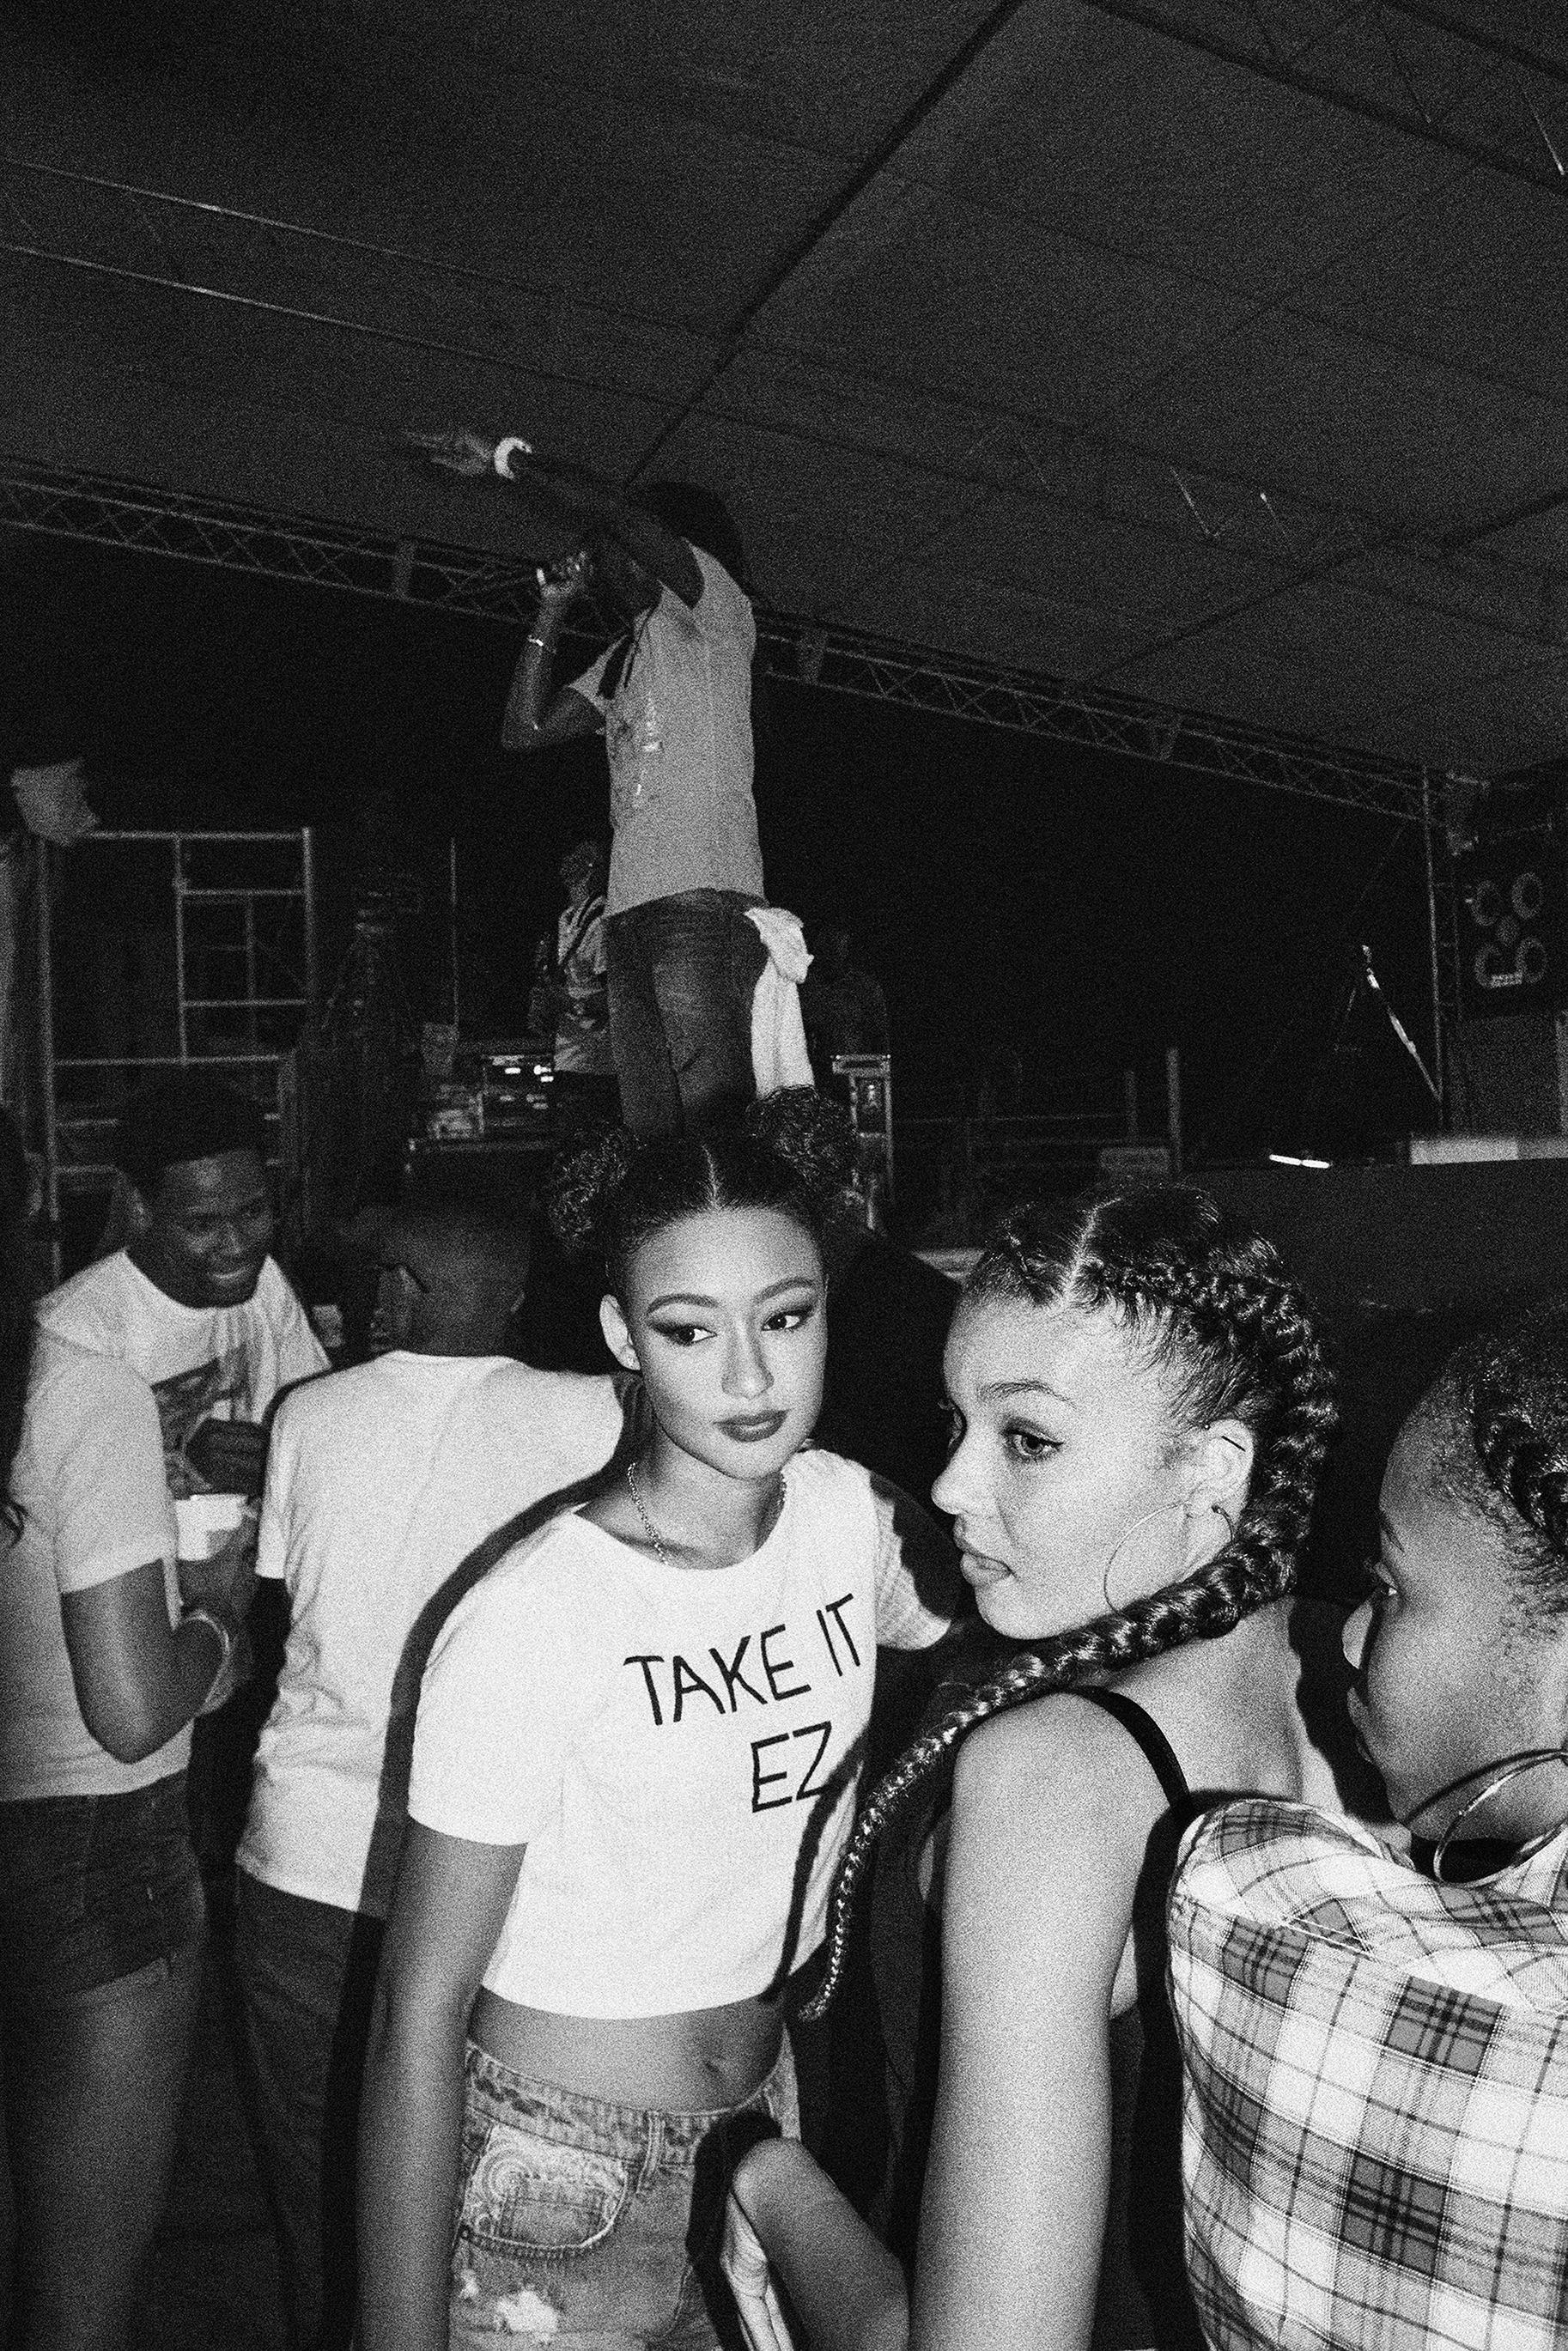 editorial-fashion-chic-edgy-flash-blackandwhite-contrast-islandgirl-carnival-festival-urban-naturalhair-flygirl-mixedchic-_04.jpg